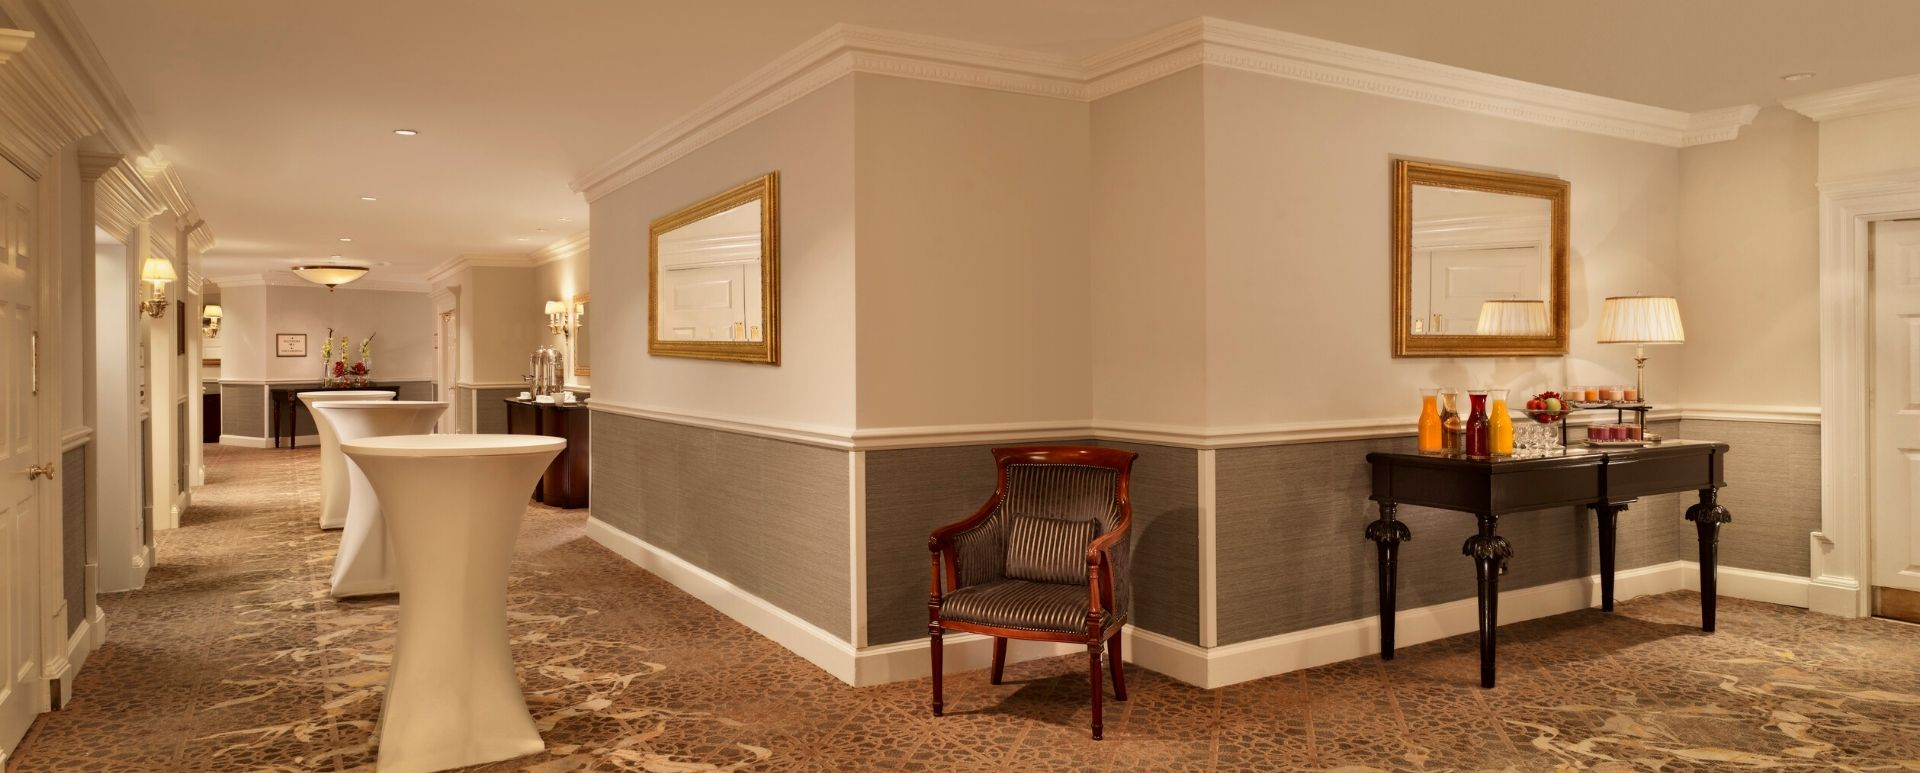 The Mezzanine Meeting Suite